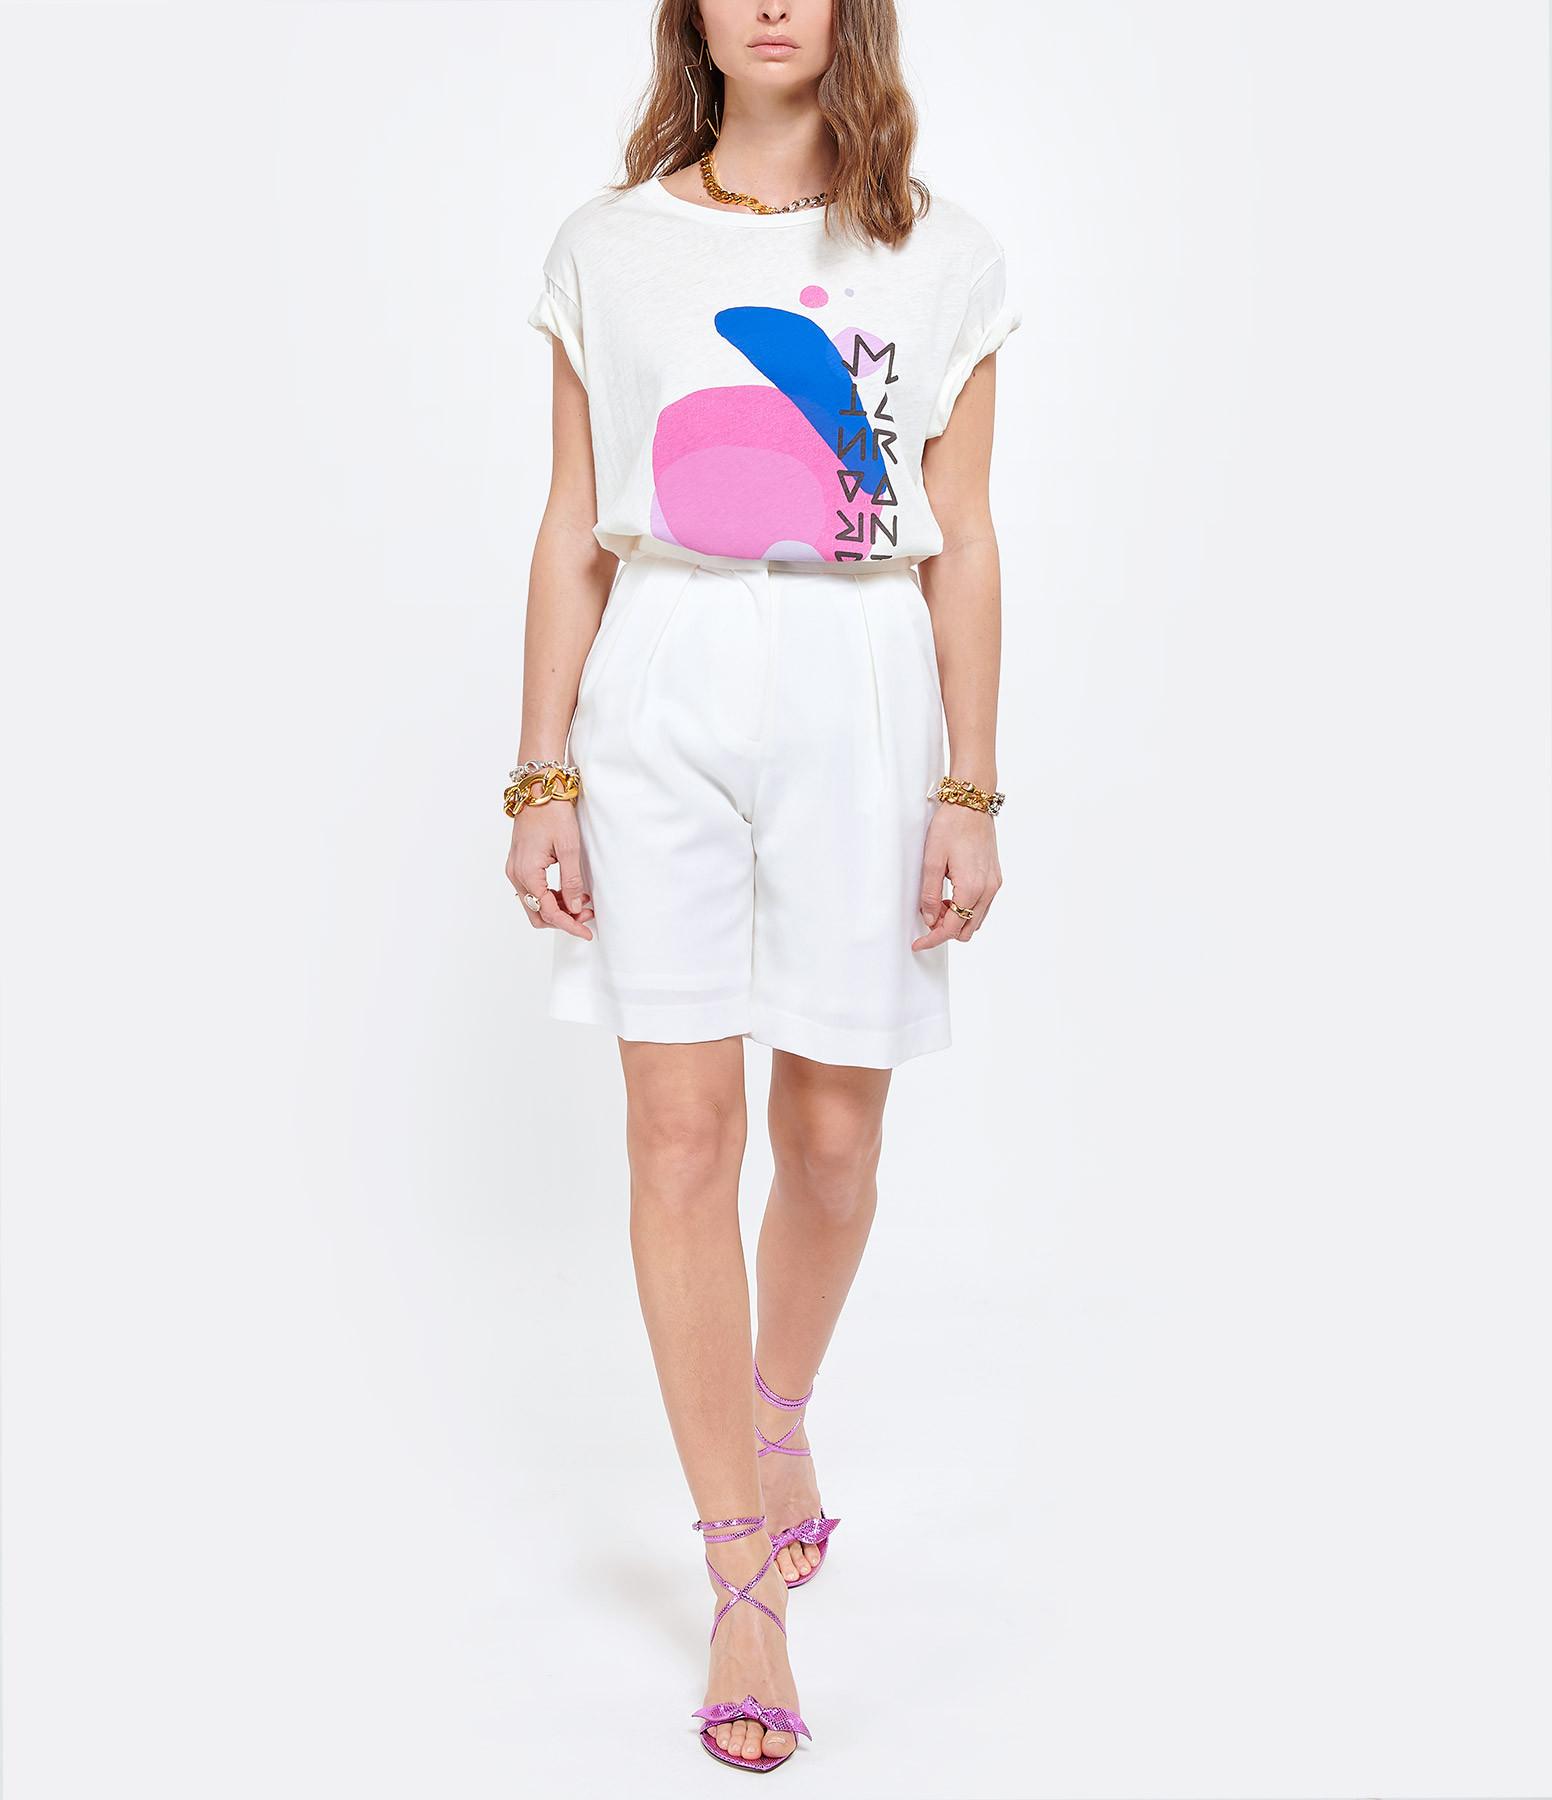 ISABEL MARANT - Tee-shirt Zaffer Coton Écru